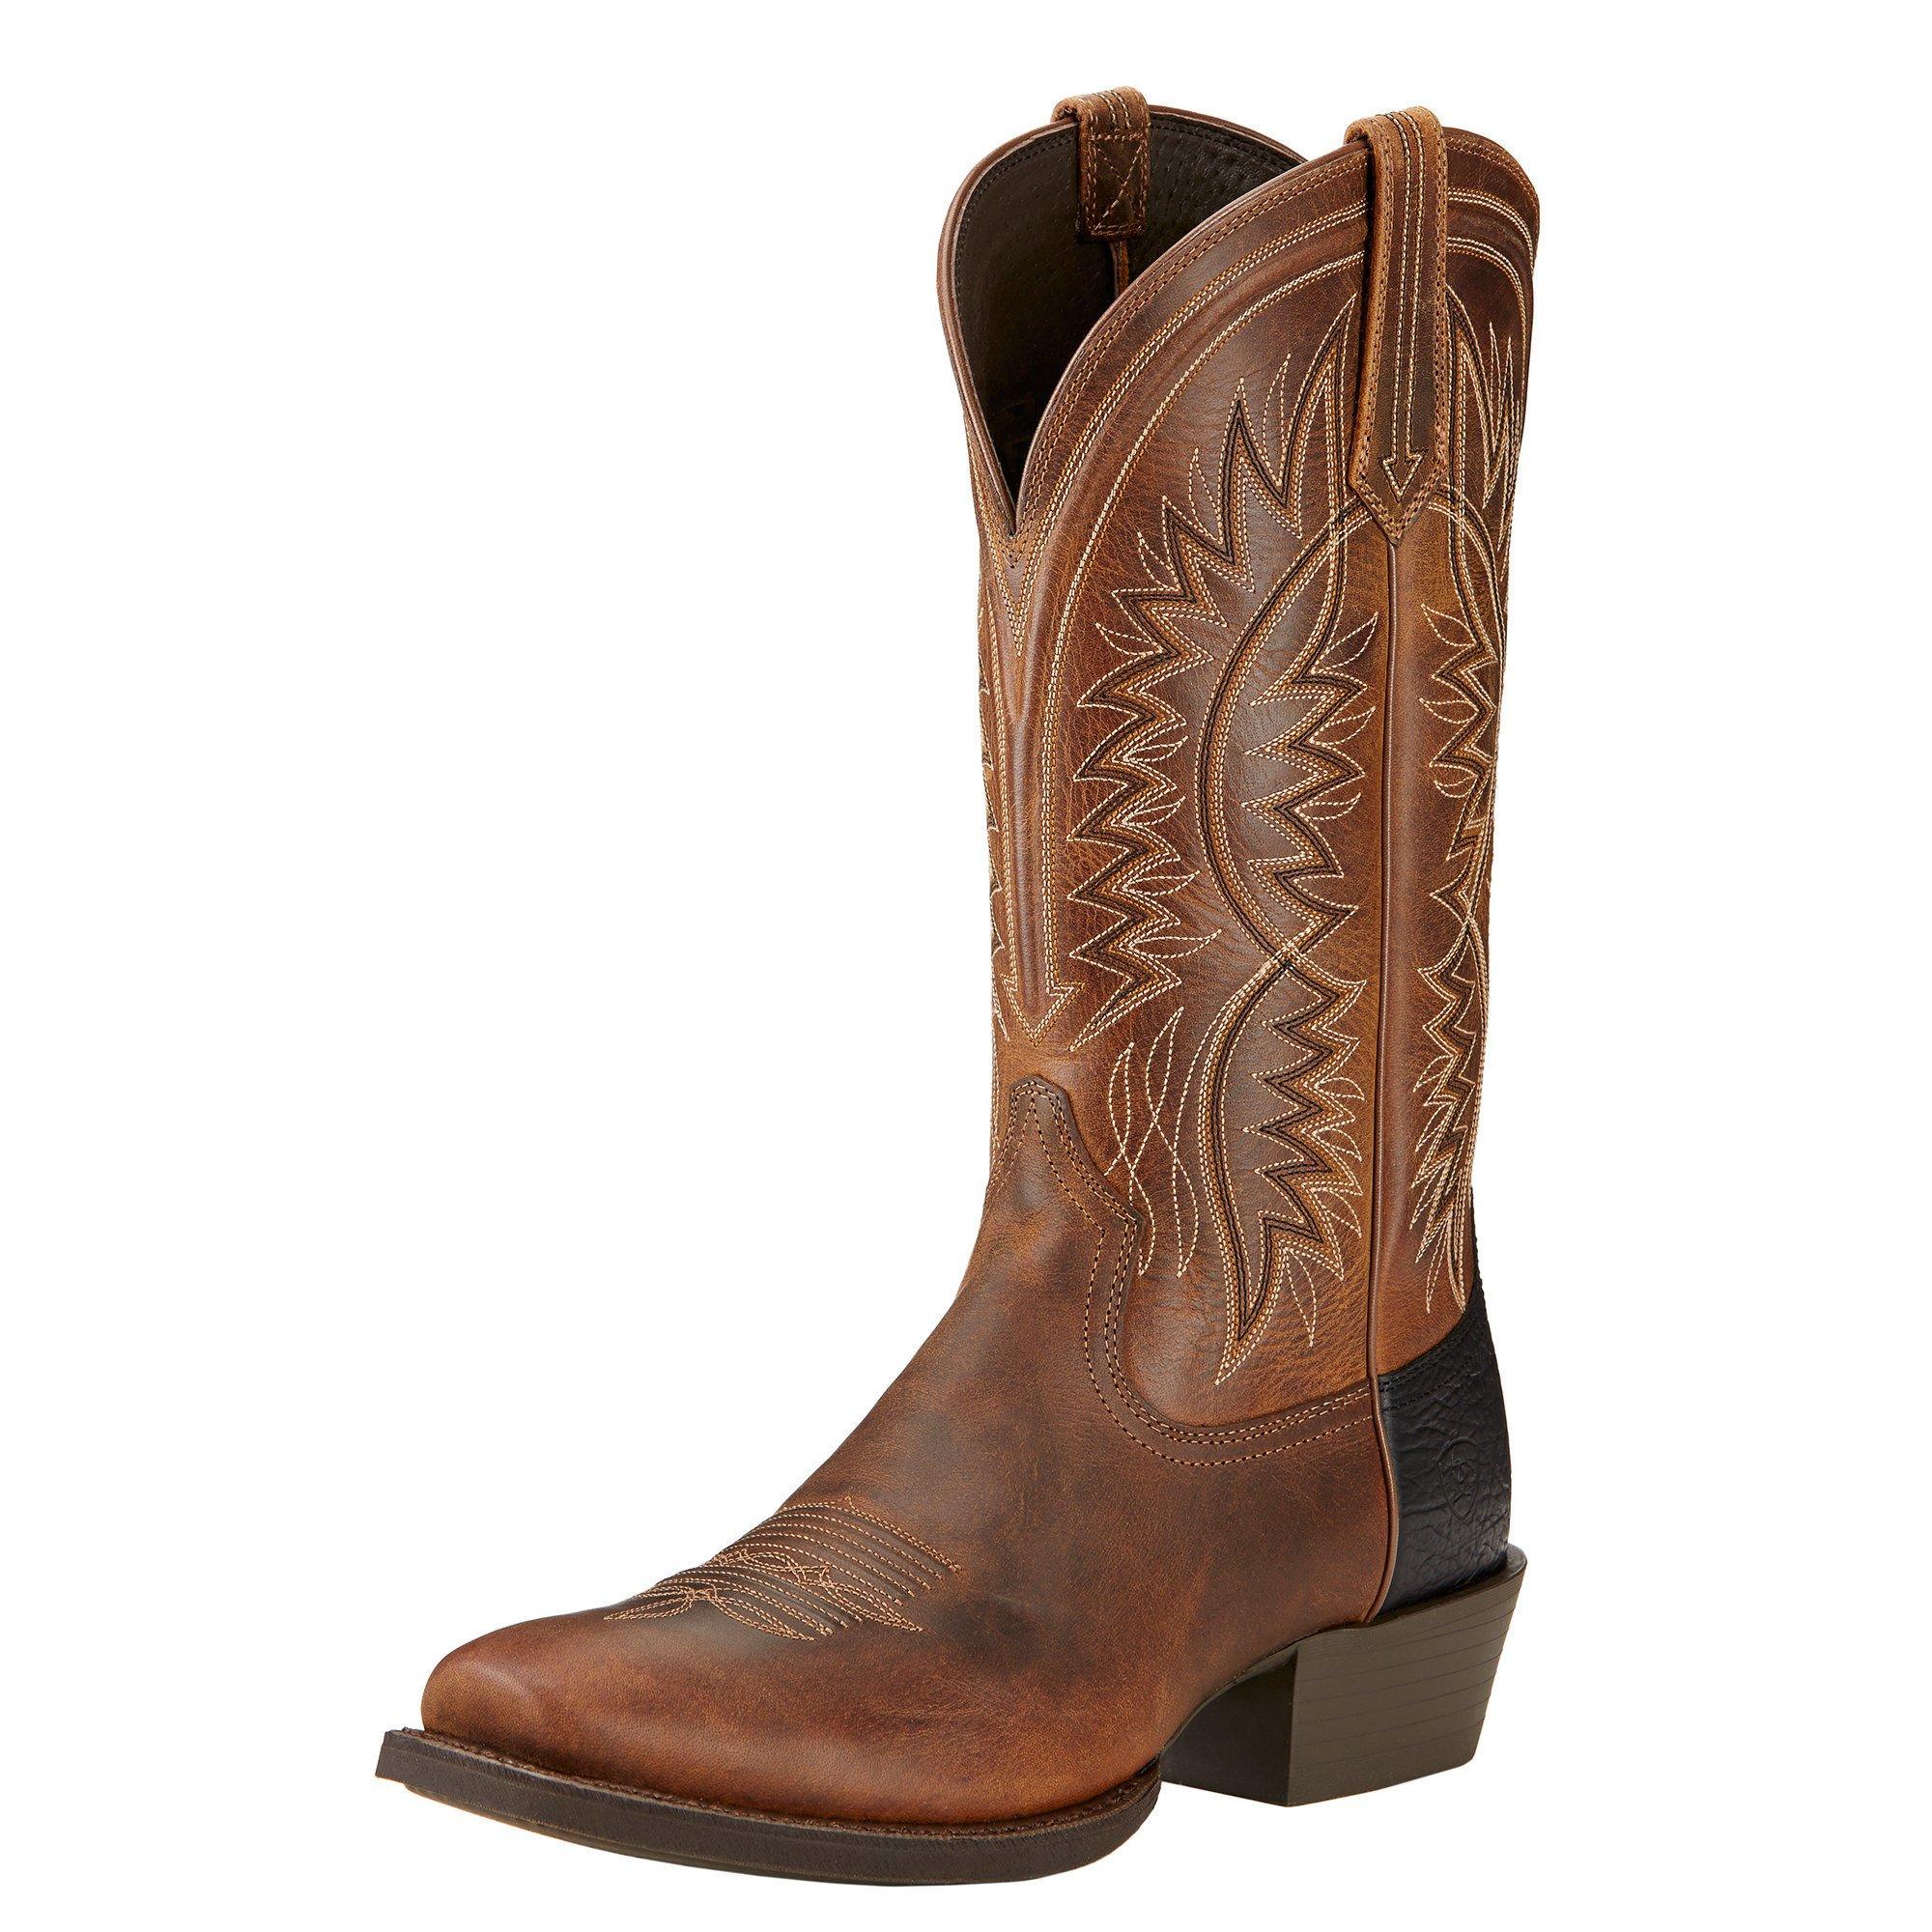 Ariat Men's Troubadour Western Cowboy Boot, Powder Brown, 10.5 D US